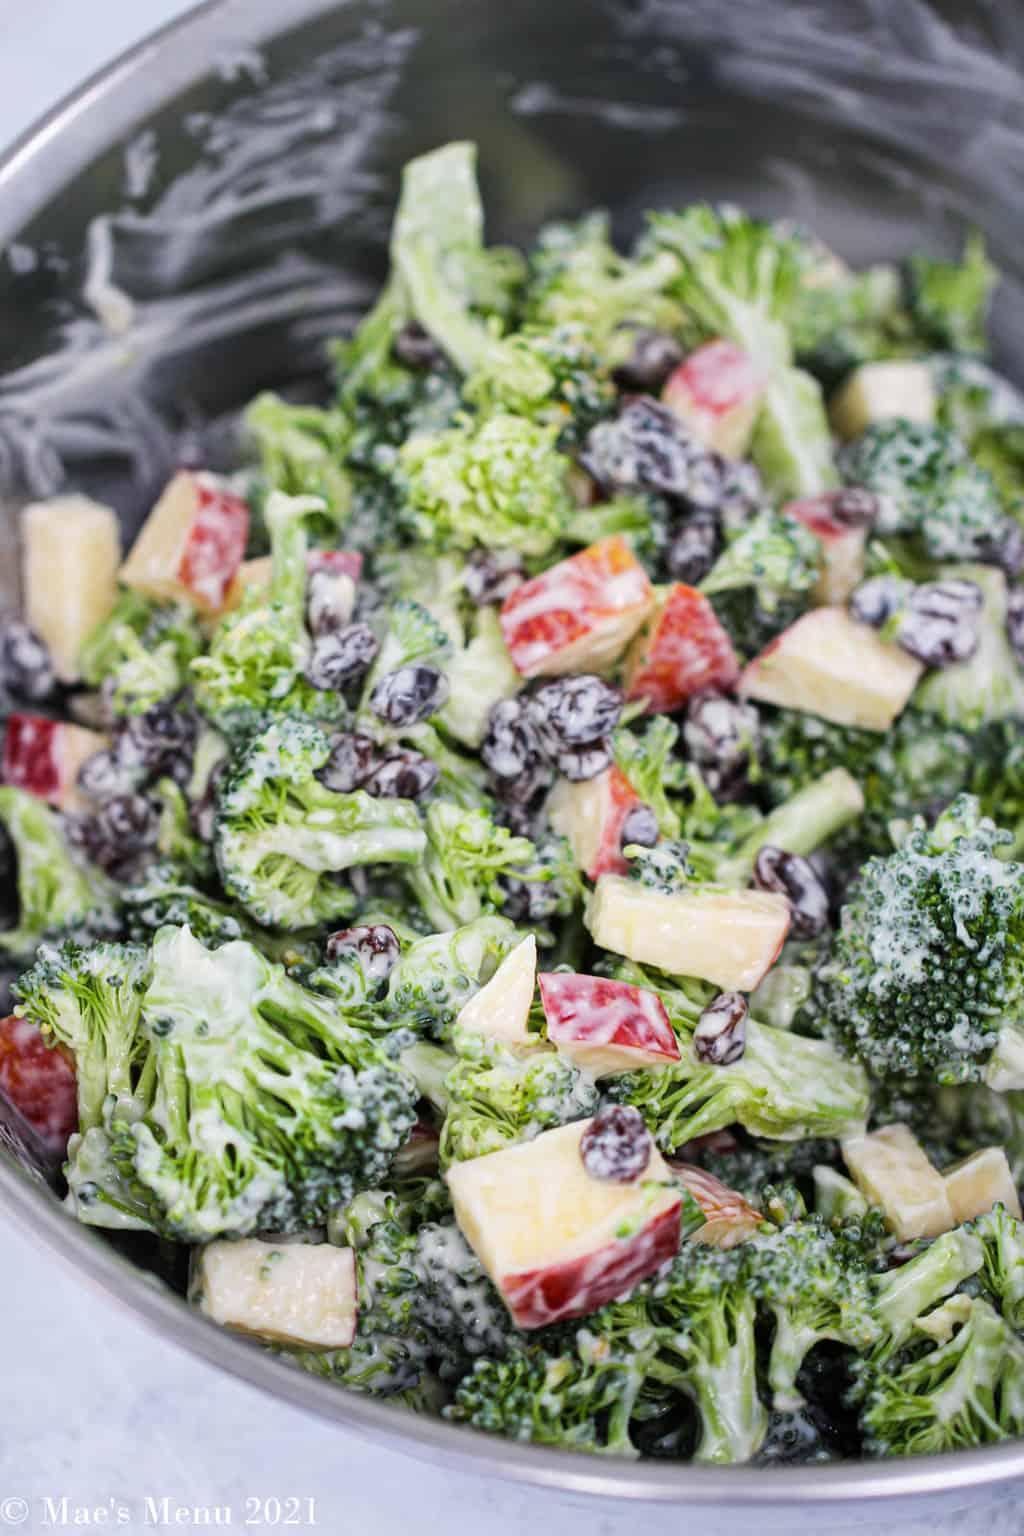 broccoli raisin salad mixed up and ready to serve